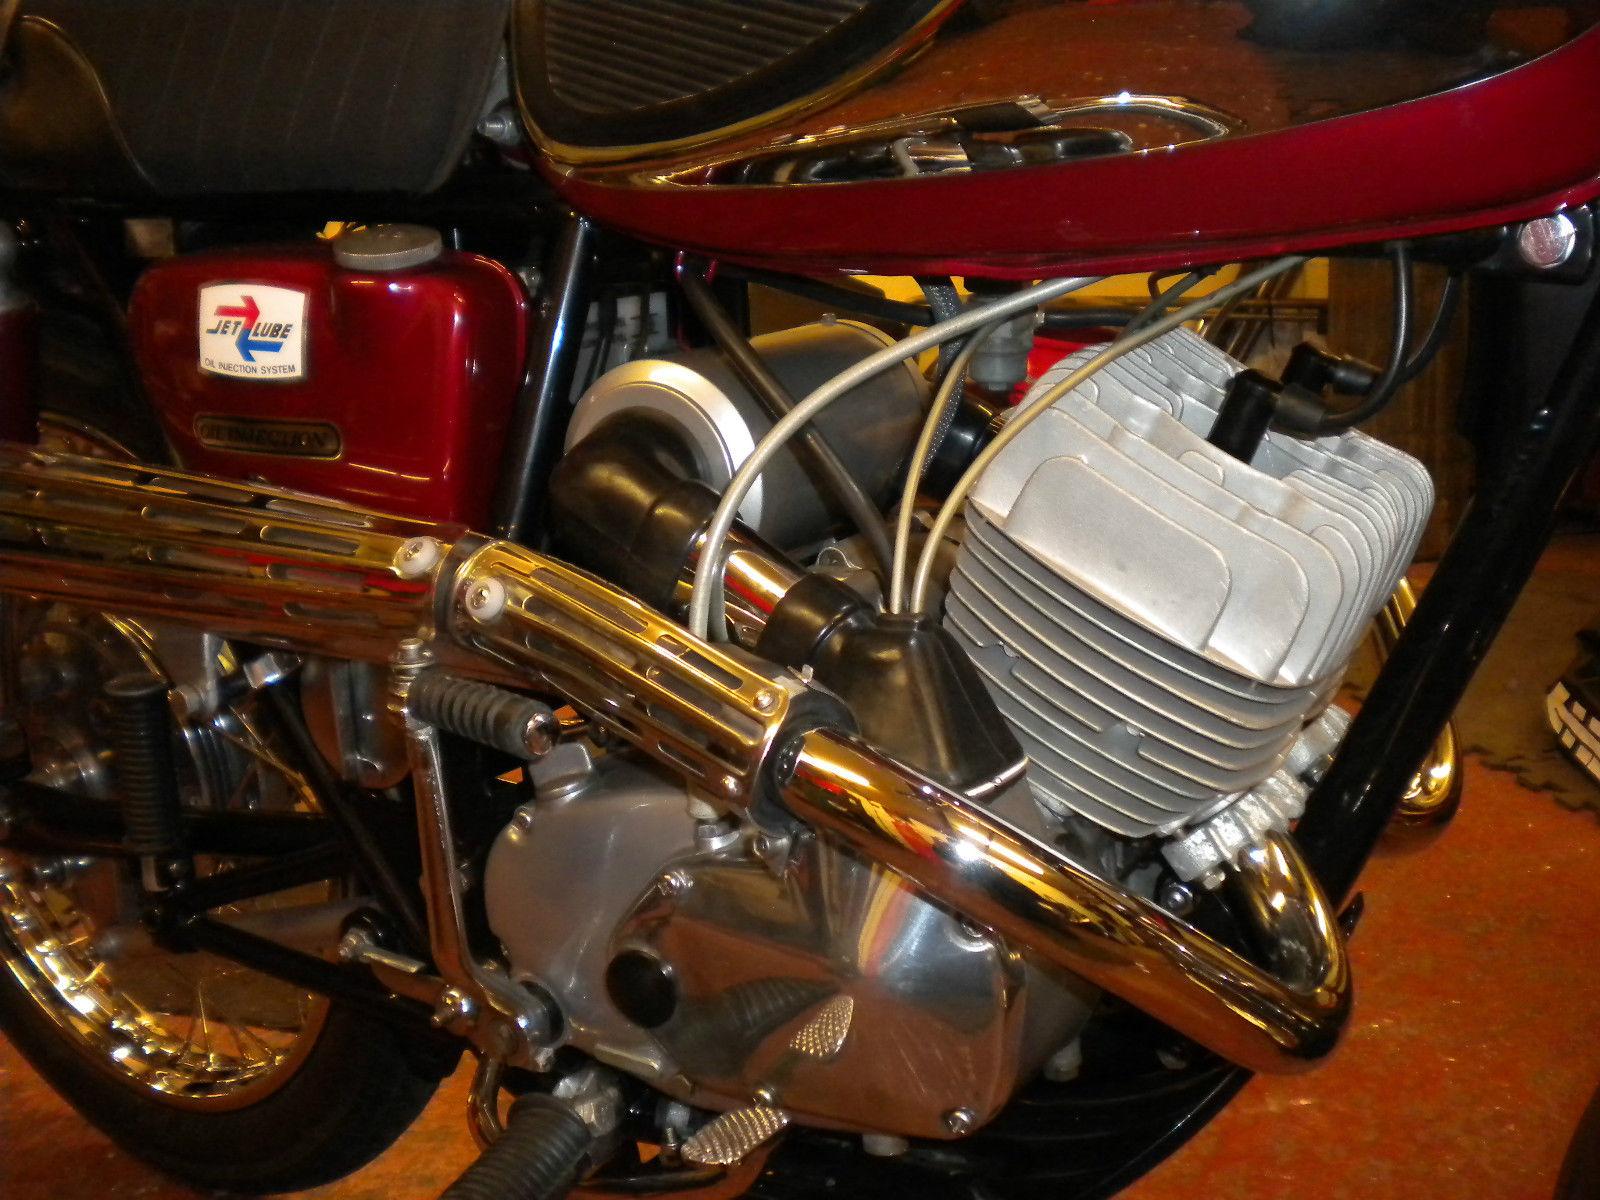 Bridgestone Mach11 -1969 - Air Filter, Muffler, Kick Start and Engine Case.